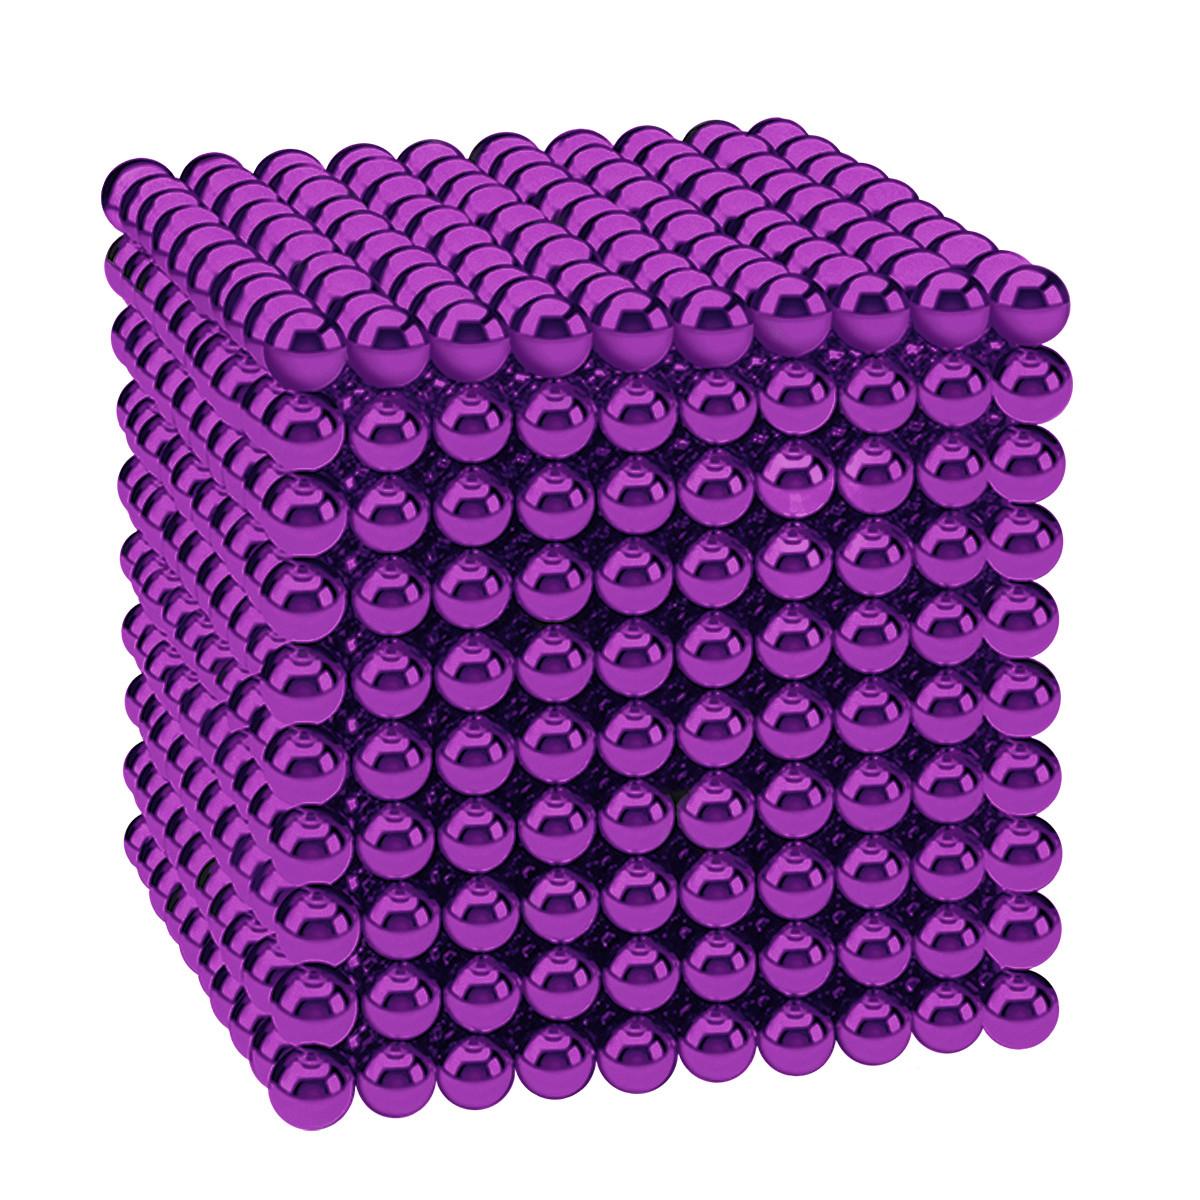 Магнитные шарики-головоломка SKY NEOCUBE (D5) комплект (1000 шт) Purple